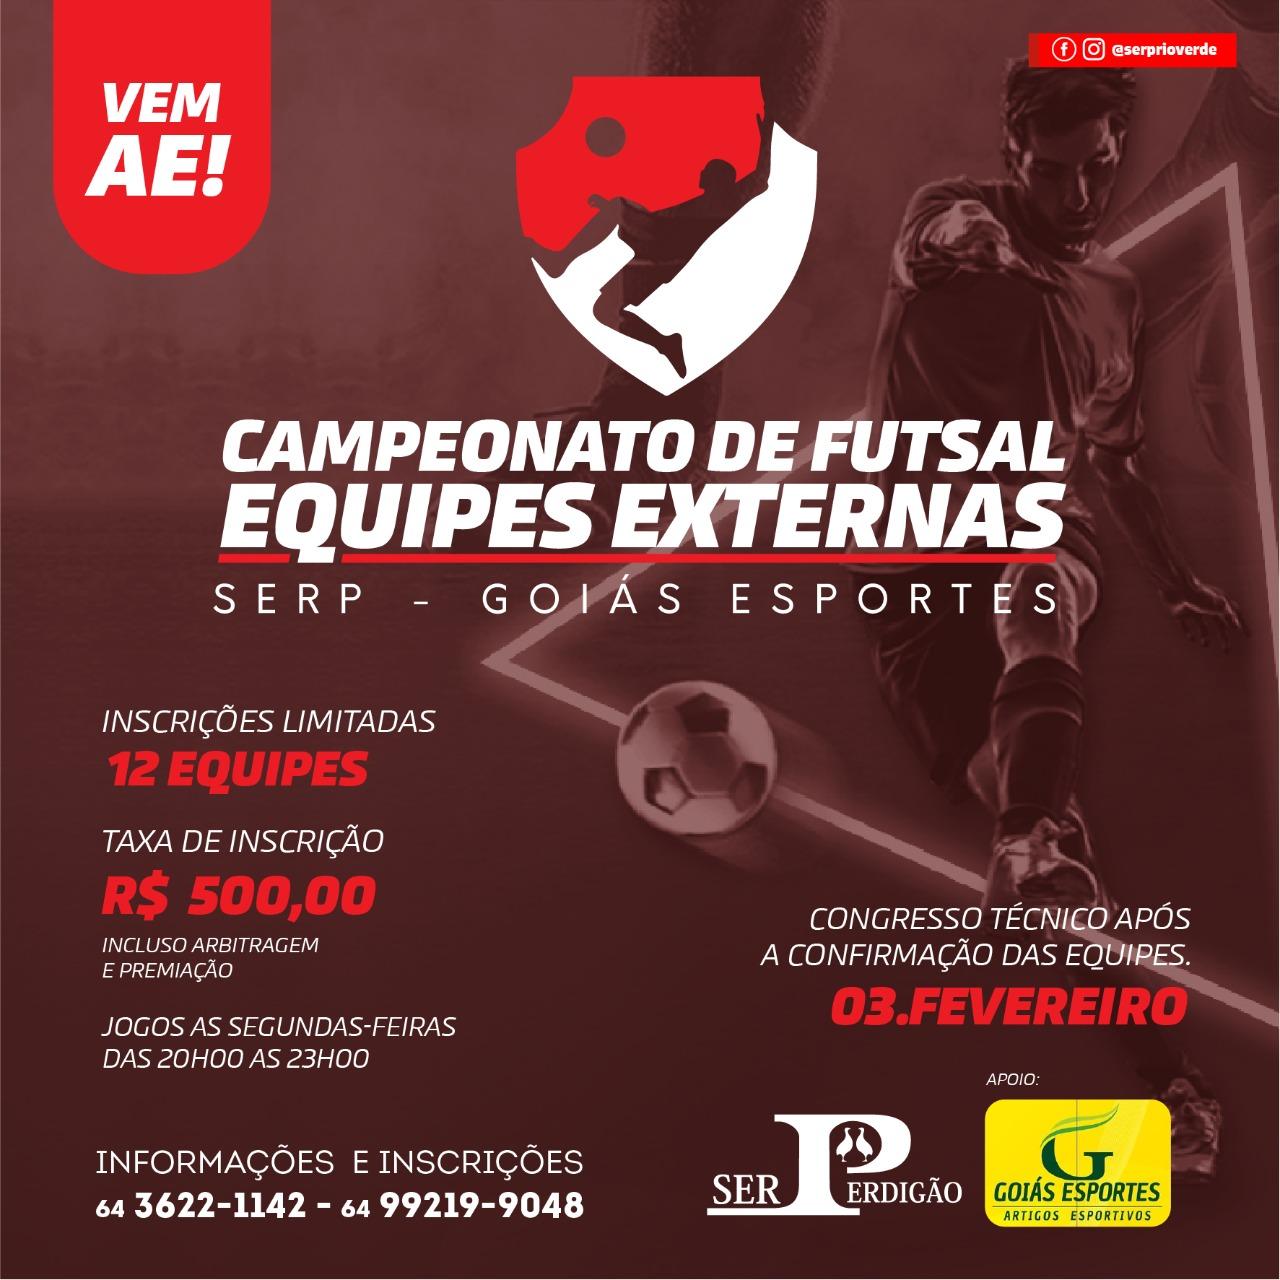 Inscrições abertas para o Campeonato de Futsal Masculino da Serp